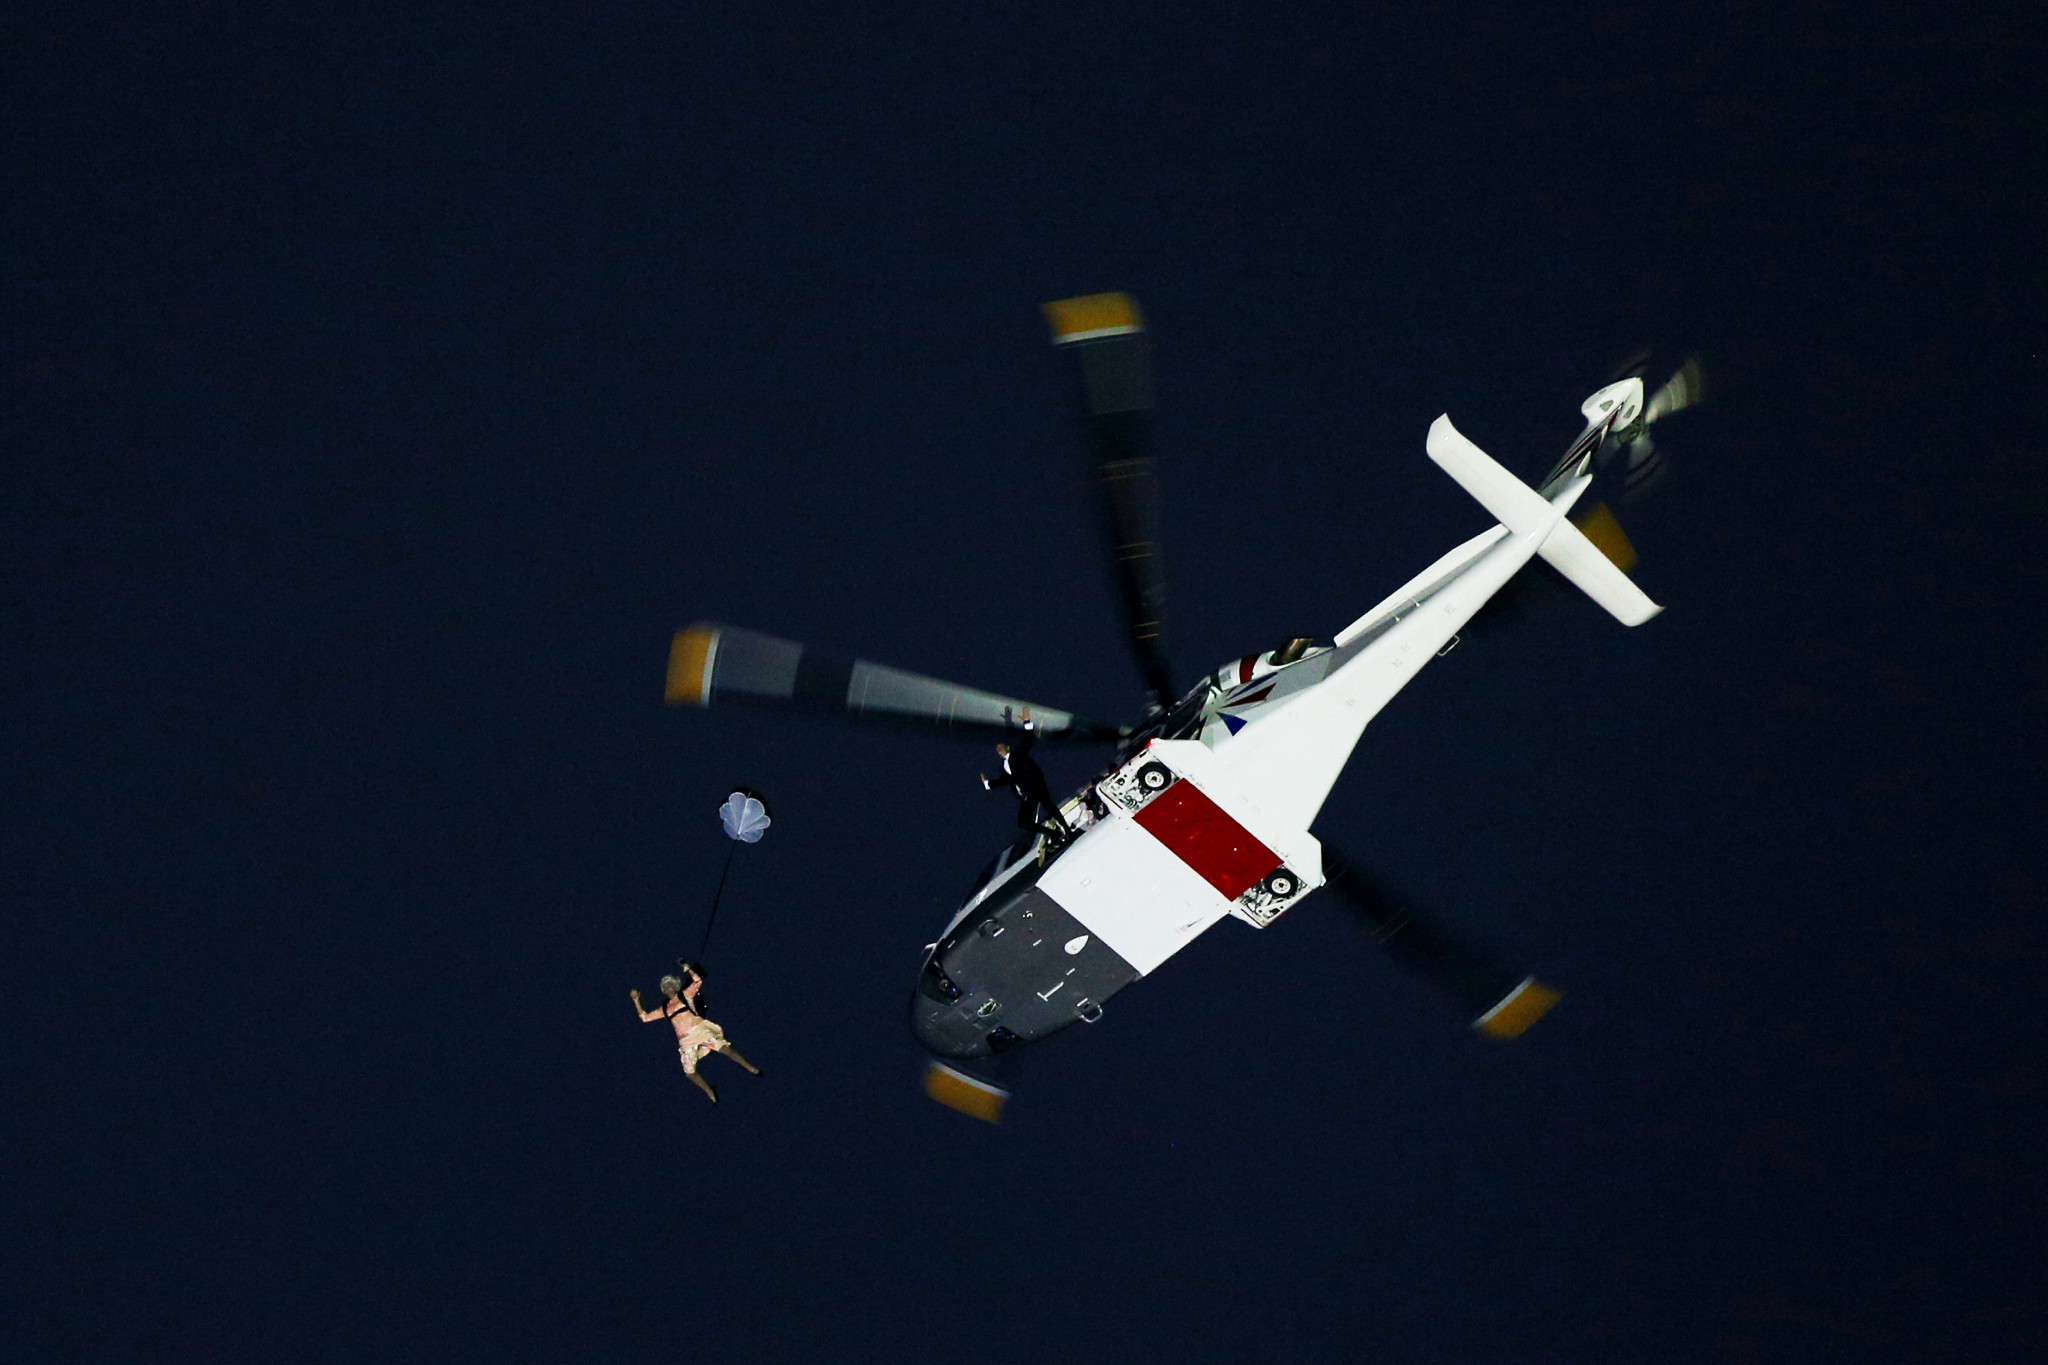 A parachute stunt featuring